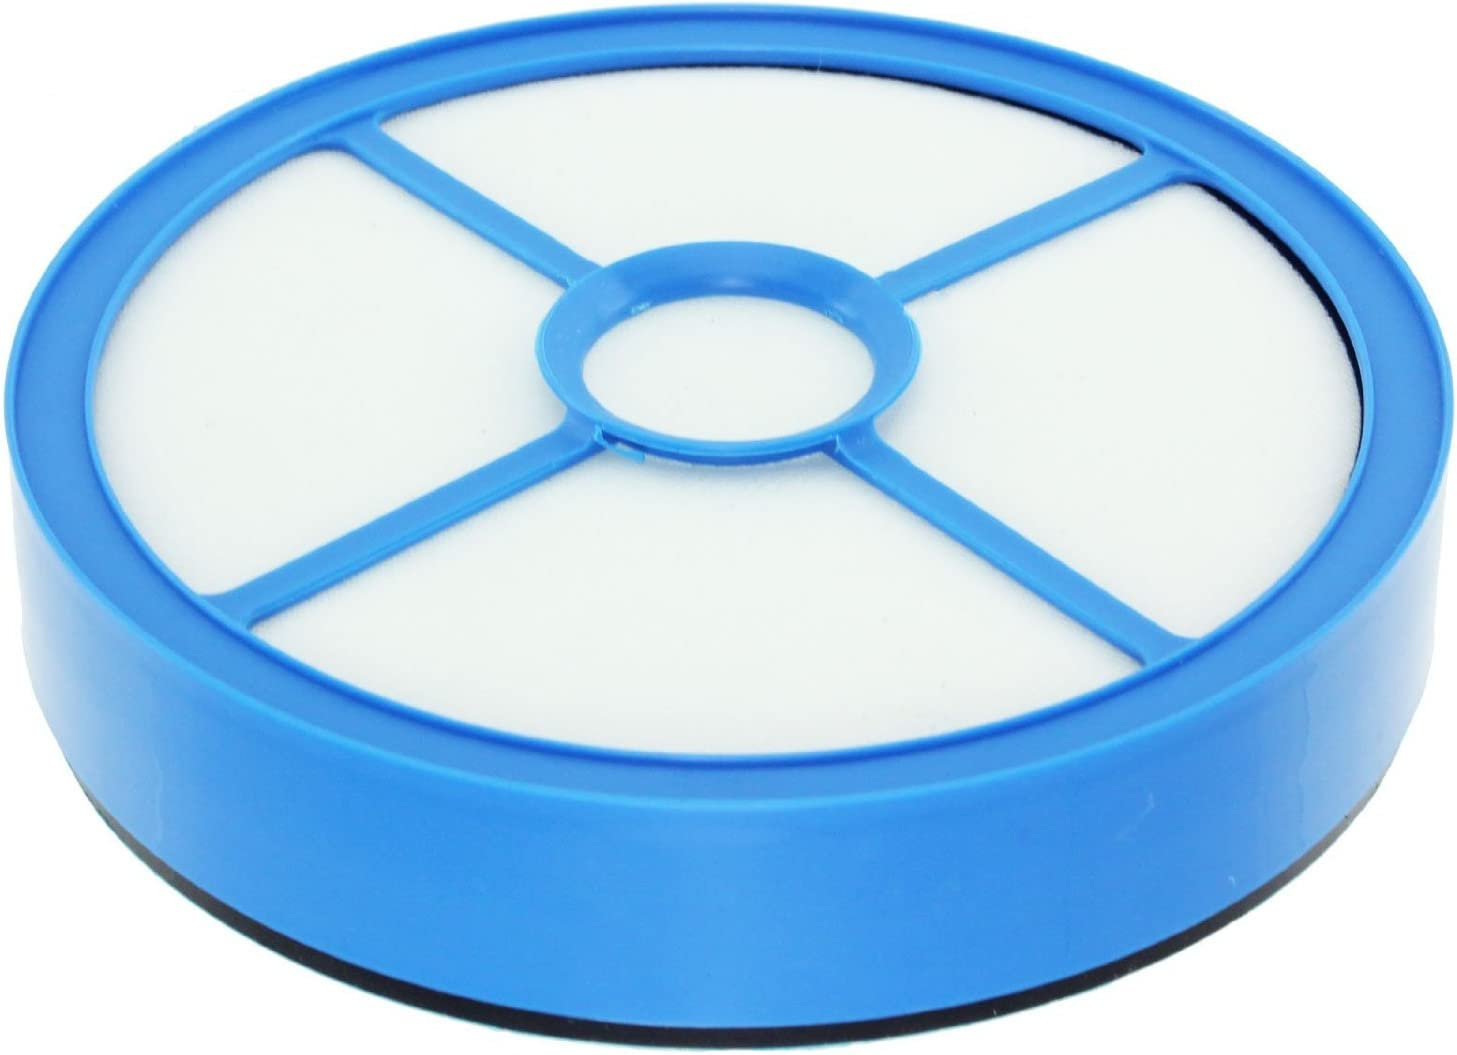 Lazer Electrics aspirador Hoover lavable Pre Motor Filtro Azul ...